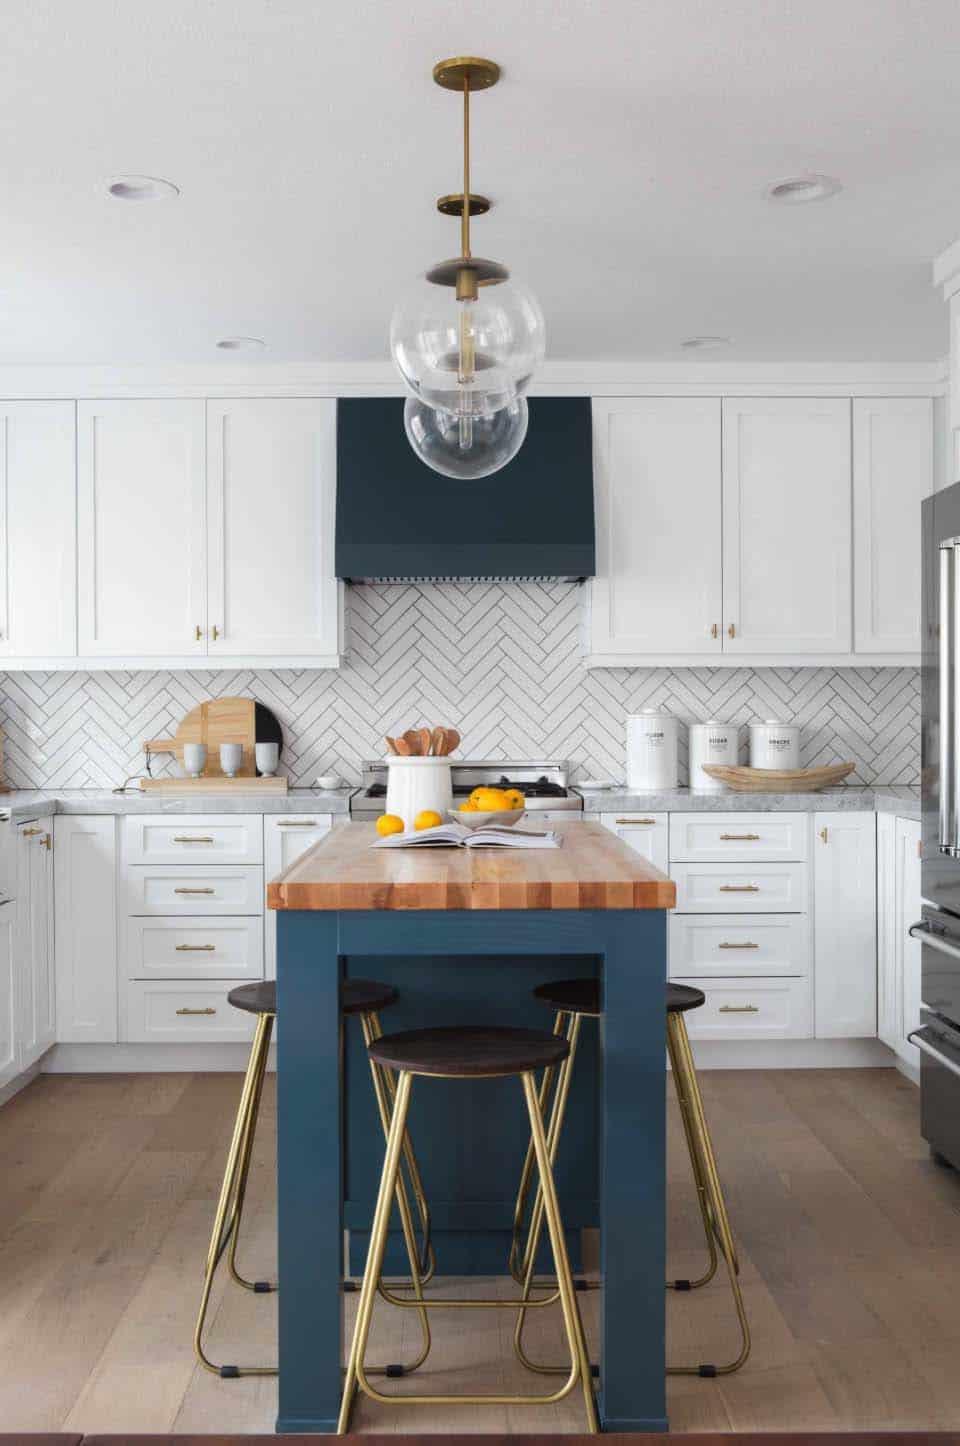 California Eclectic Home-Lindye Galloway Interiors-11-1 Kindesign